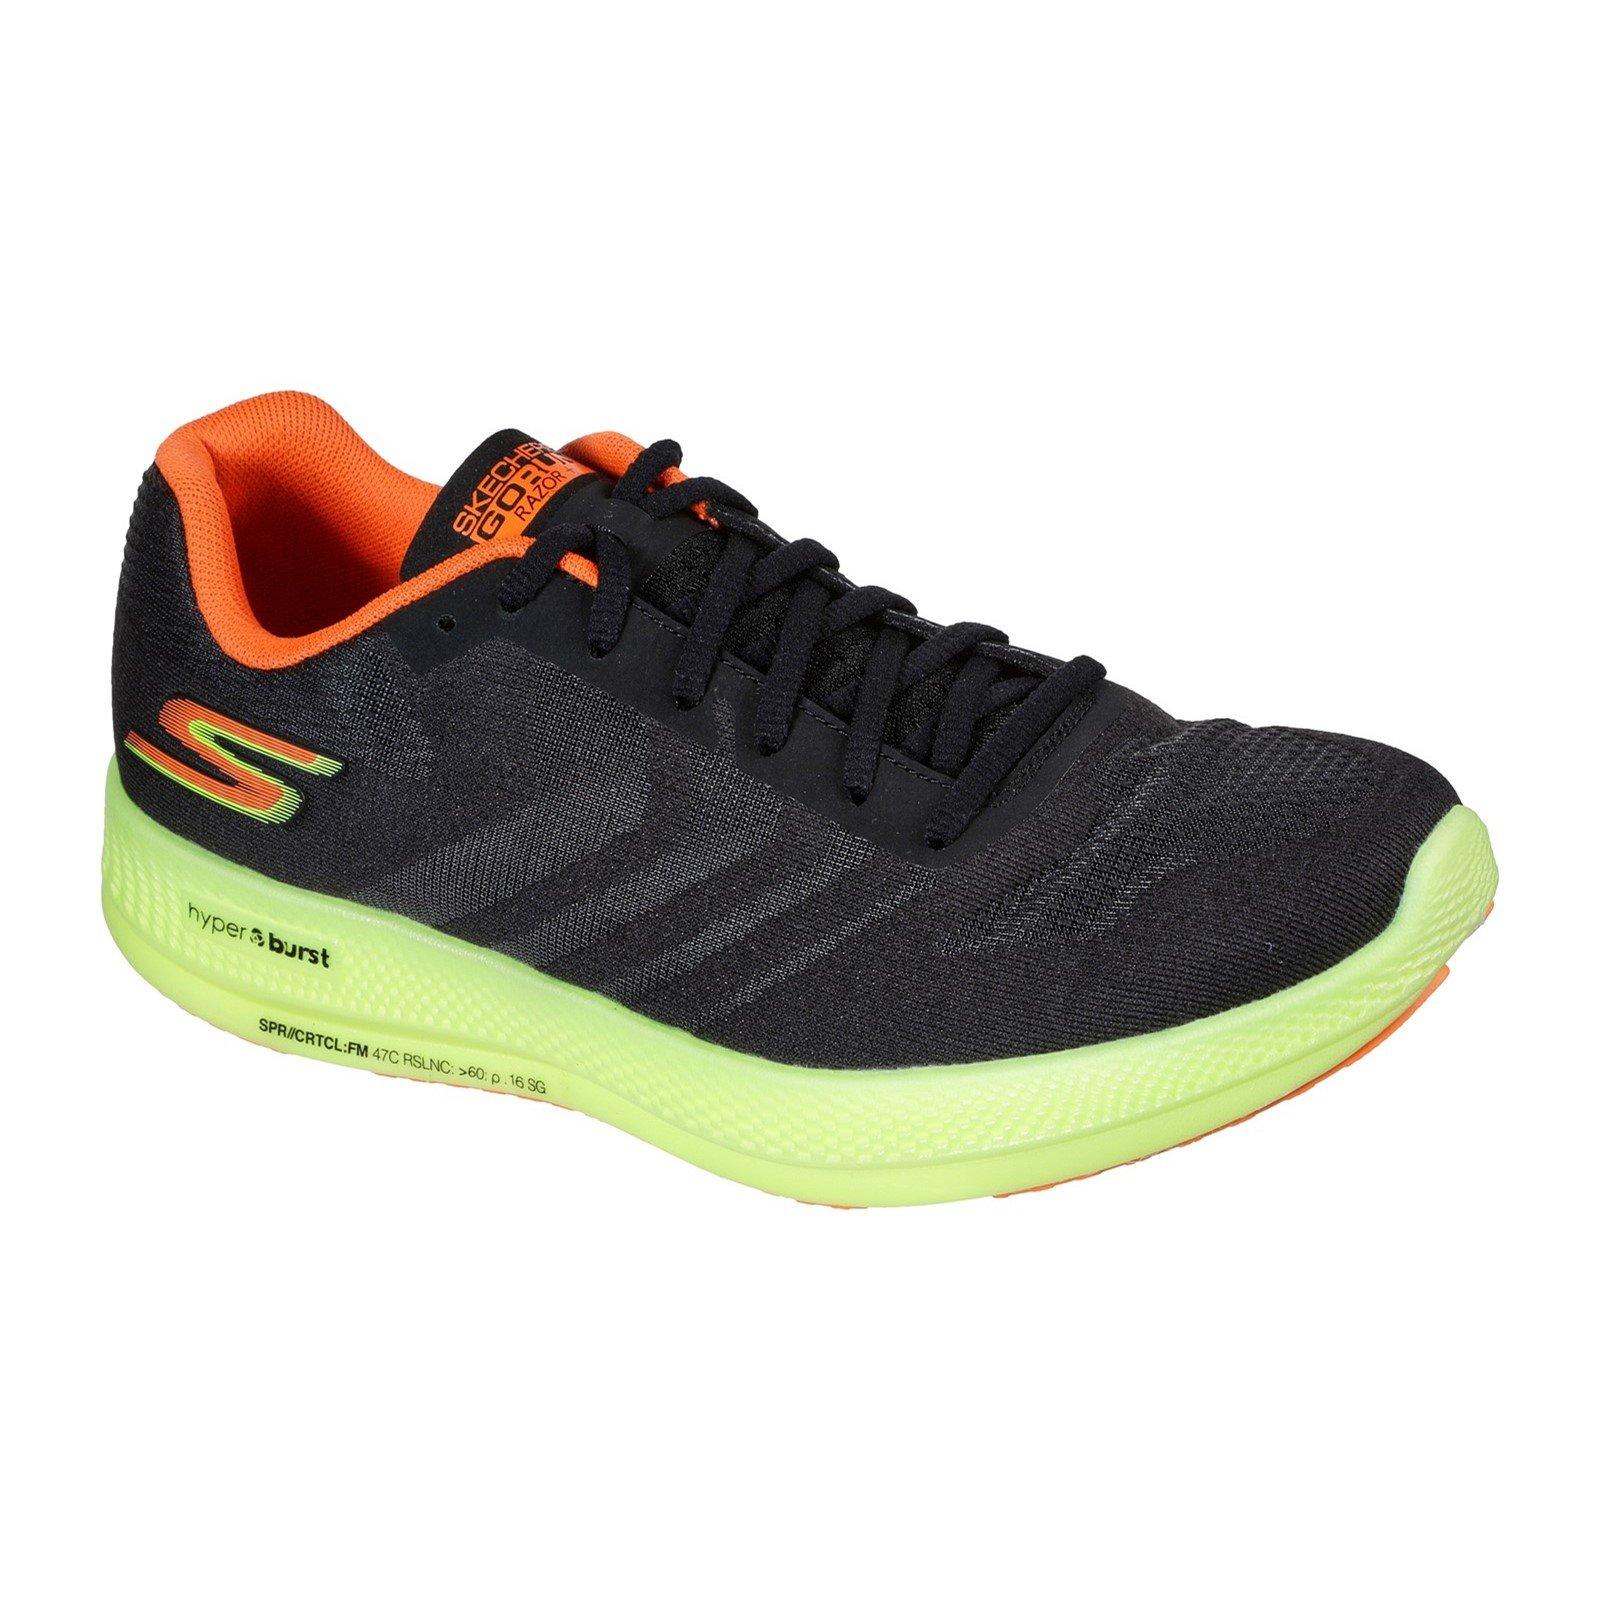 Skechers Women's Go Run Razor Trainer Various Colours 32703 - Black/Yellow/Orange 4